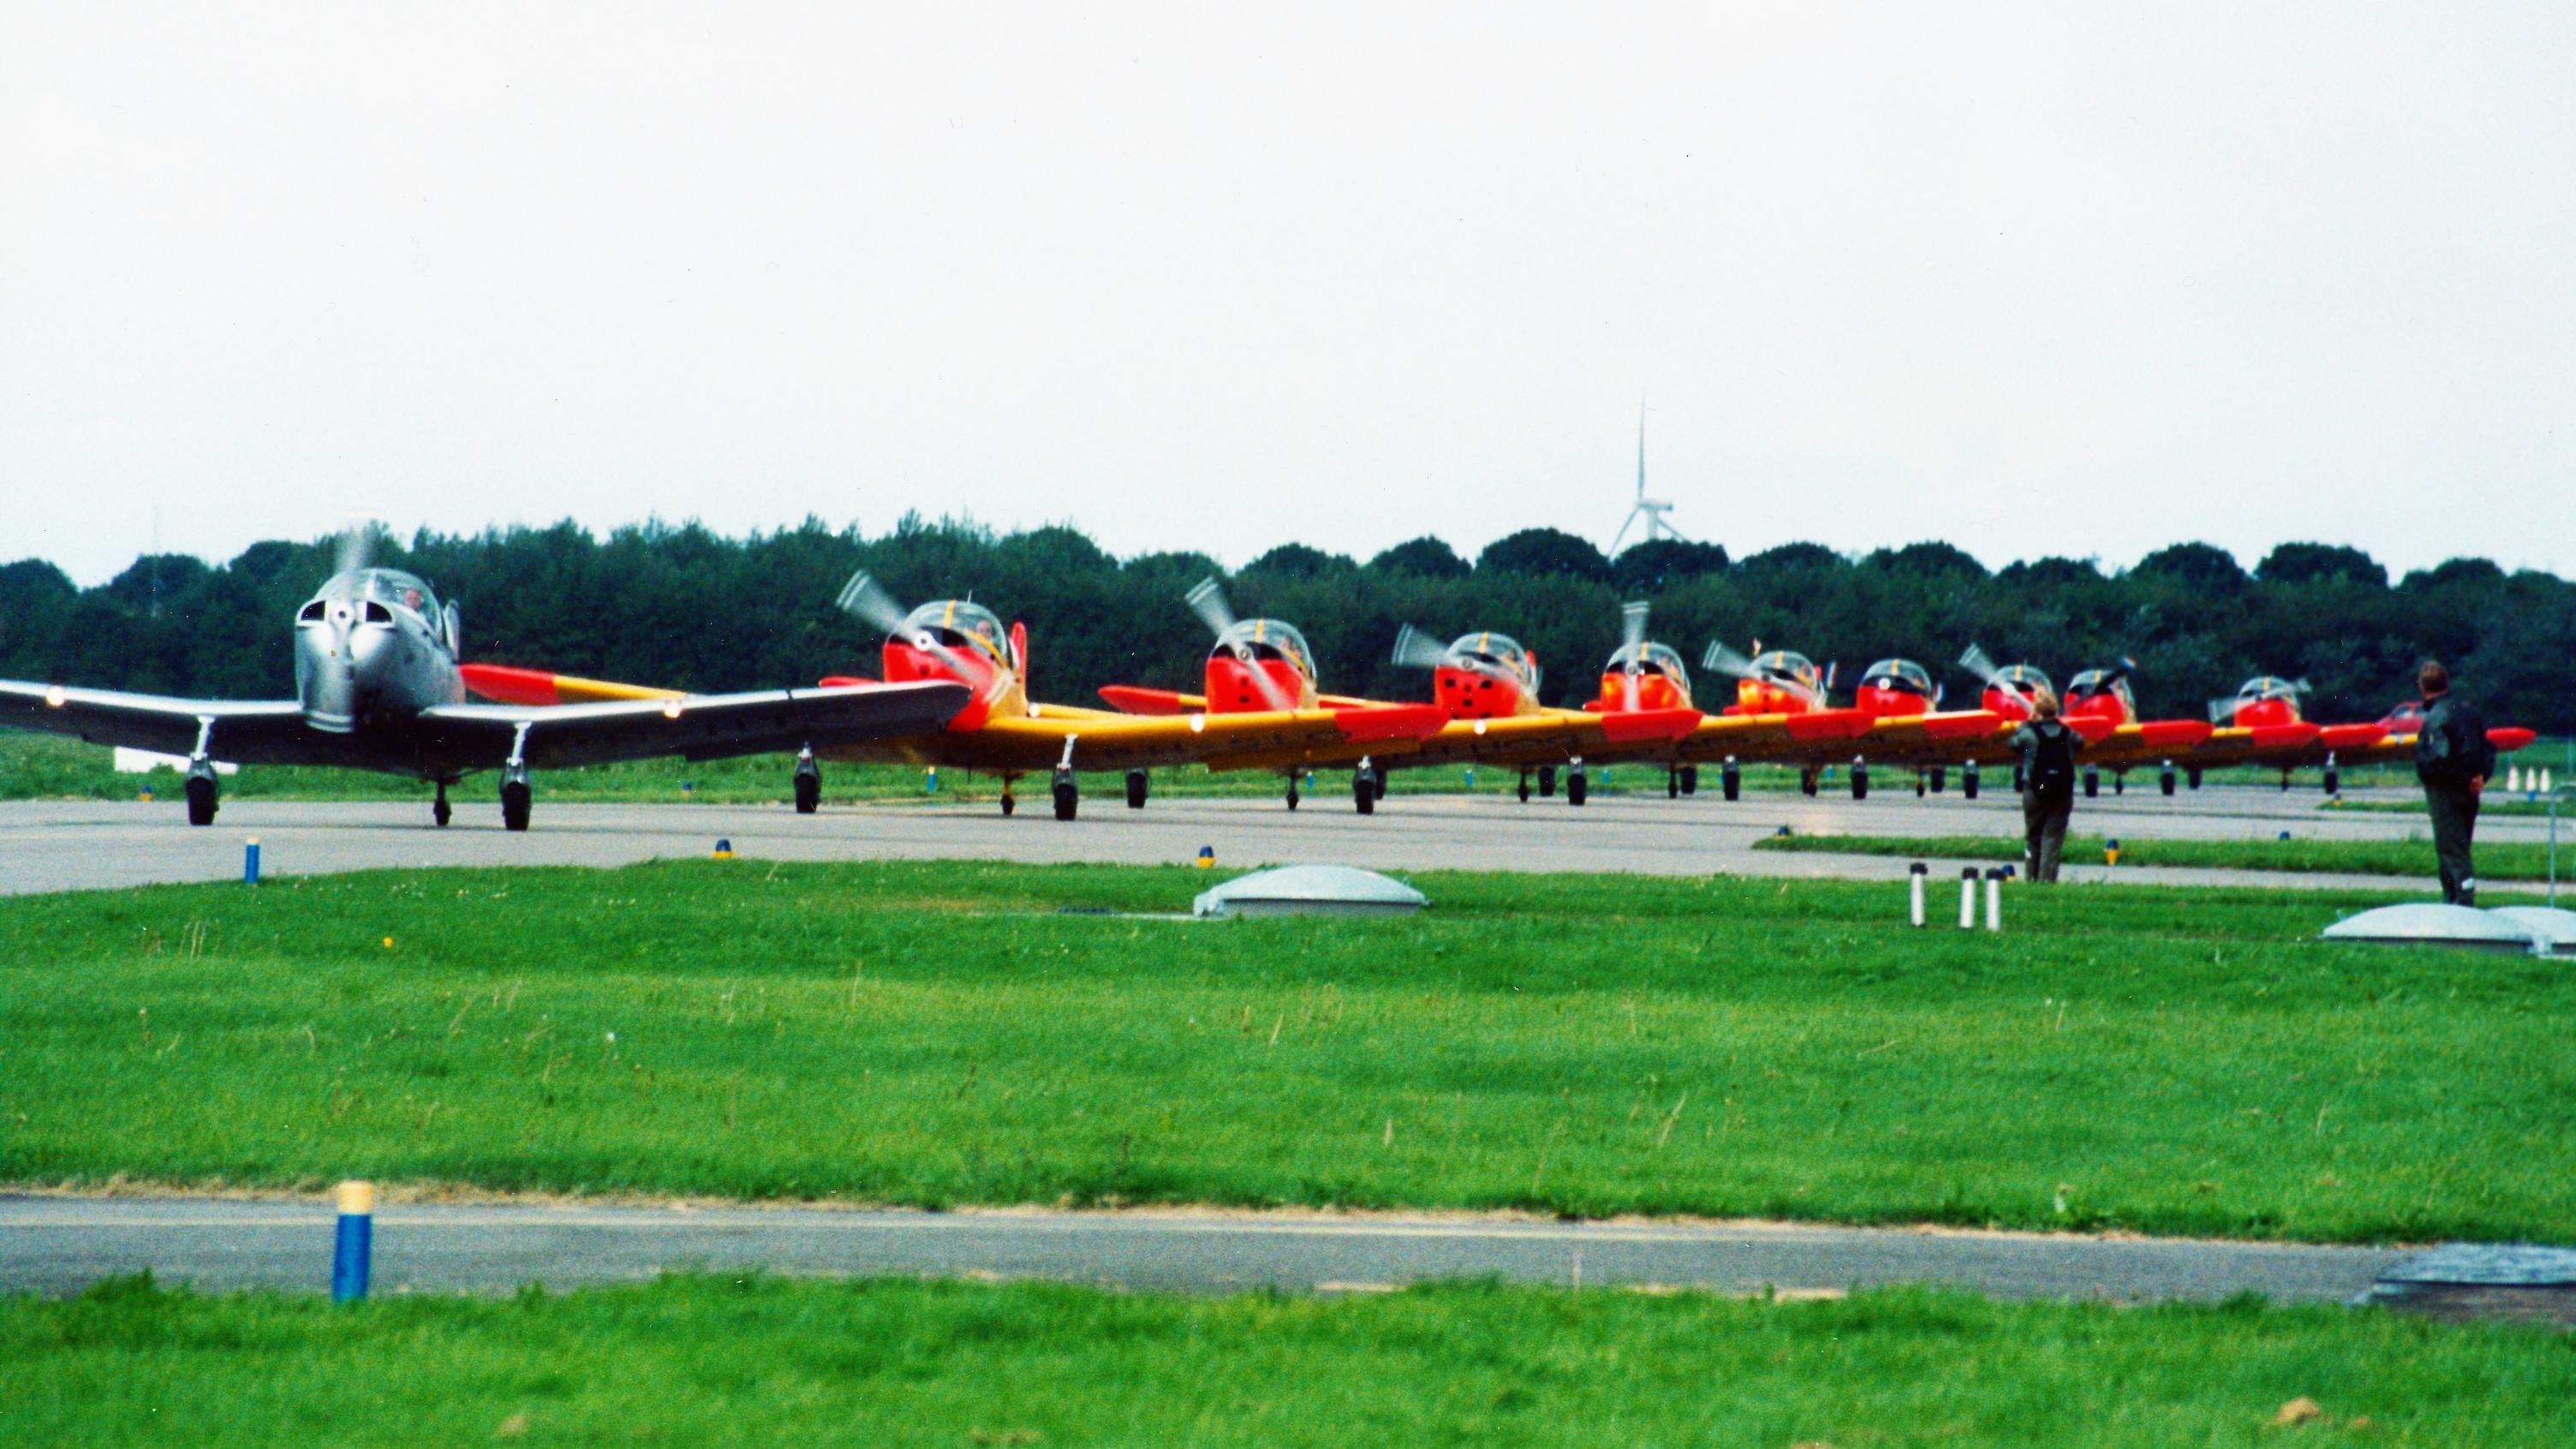 Naam: Fokker S.11 10x 1991 Lelystad.jpg Bekeken: 160 Grootte: 508,3 KB